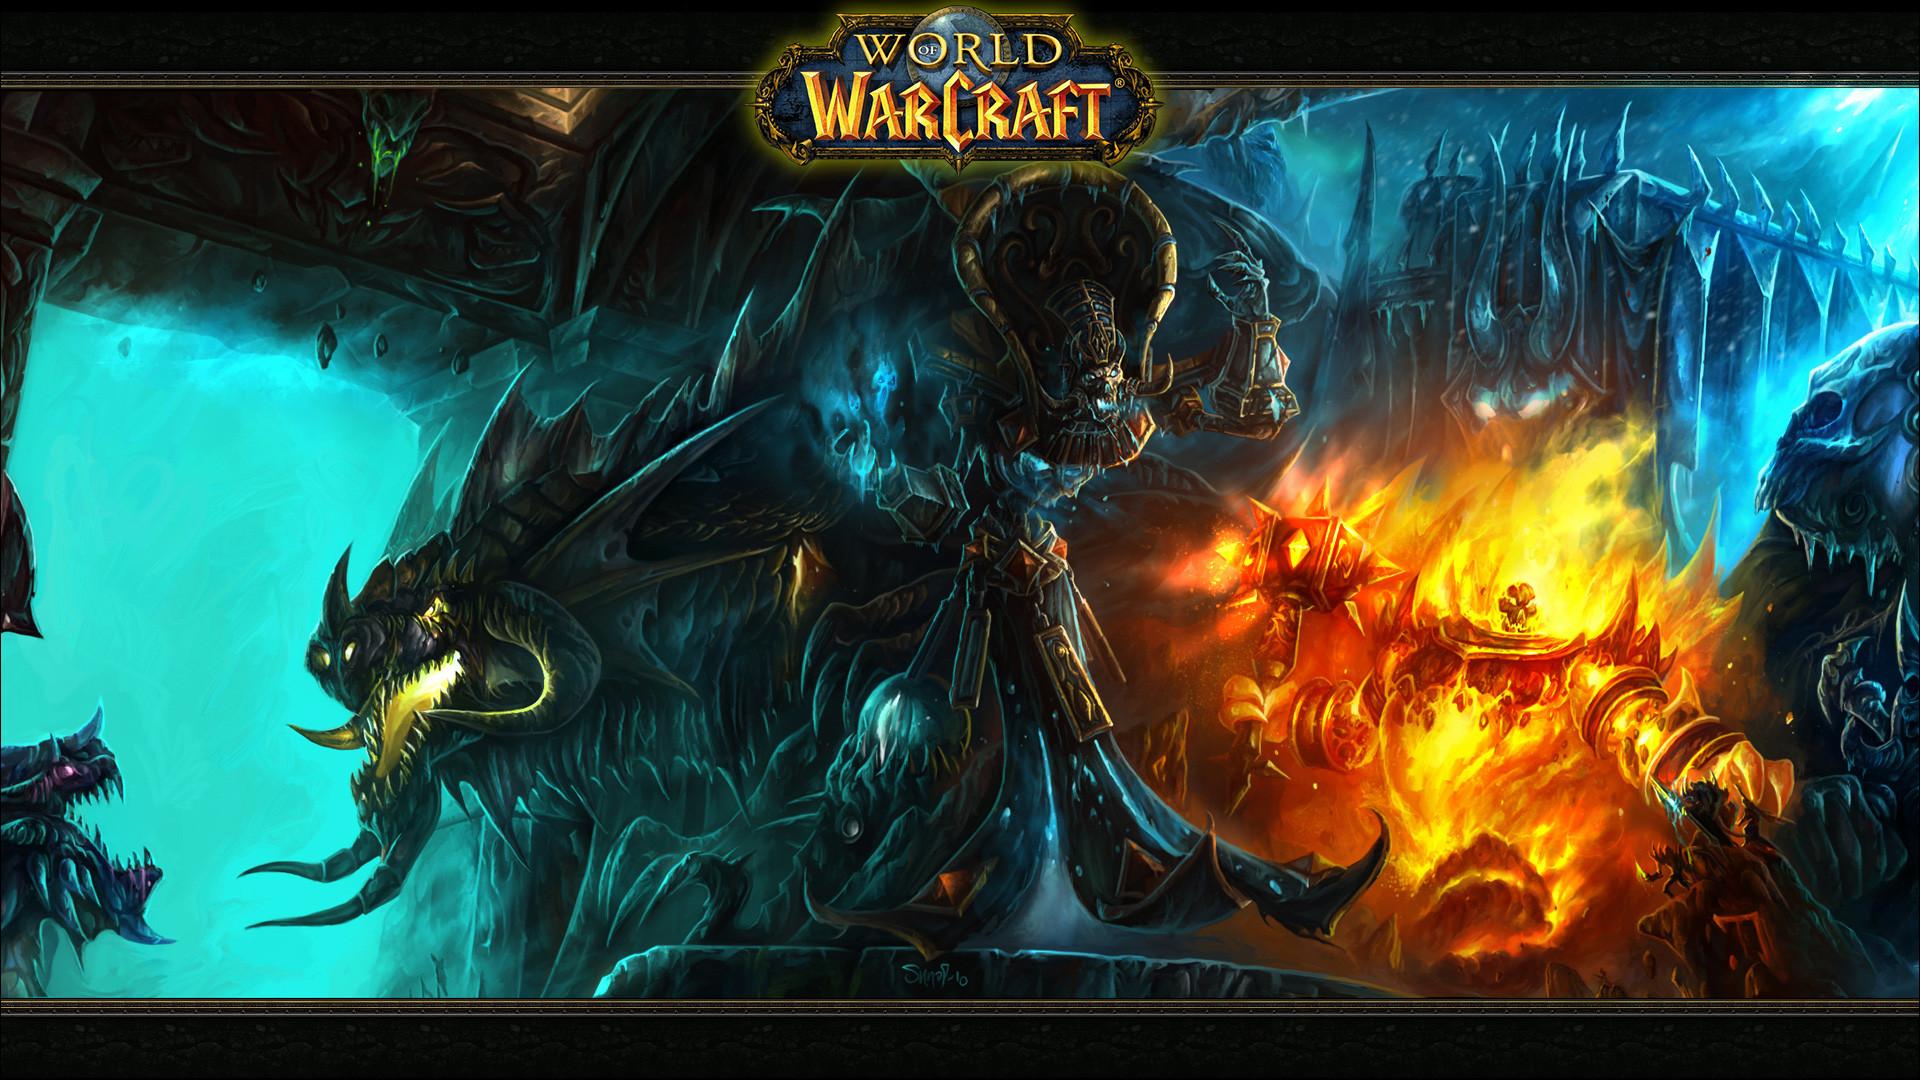 World of Warcraft | World of Warcraft wow desktop Full HD Wallpapers and  Desktop Backgrounds HD Images | Pinterest | Wallpaper and Desktop  backgrounds